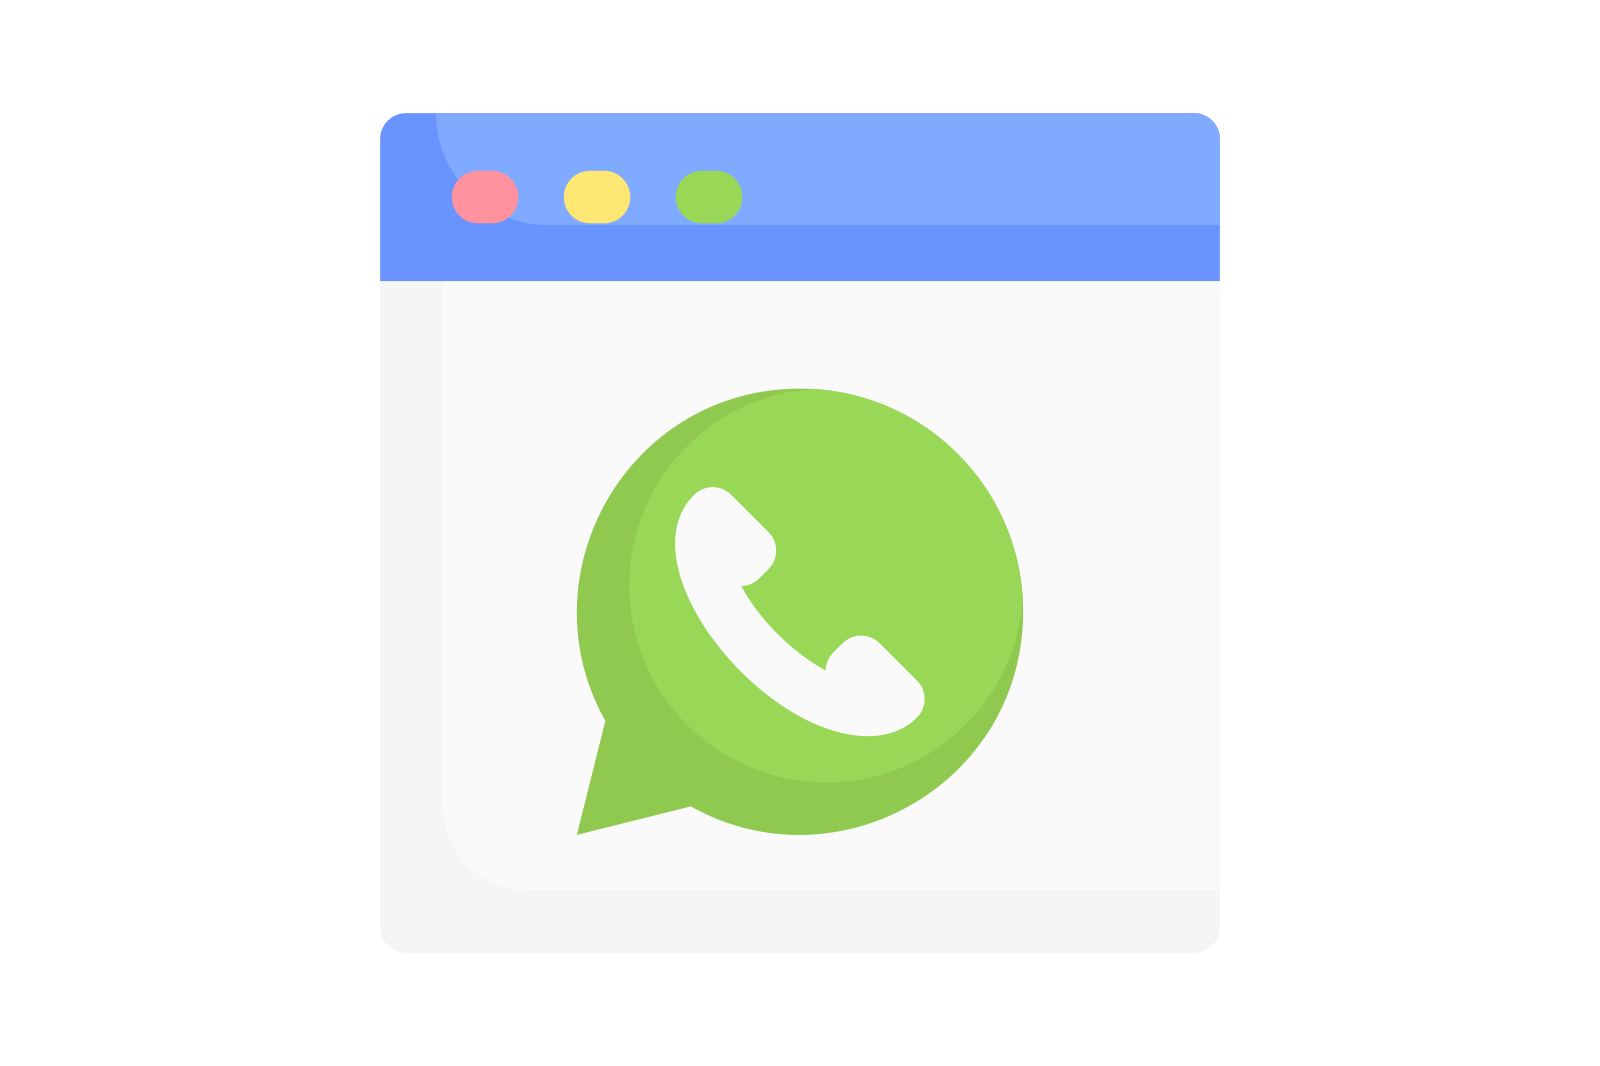 Delivery integrado com Whatsapp